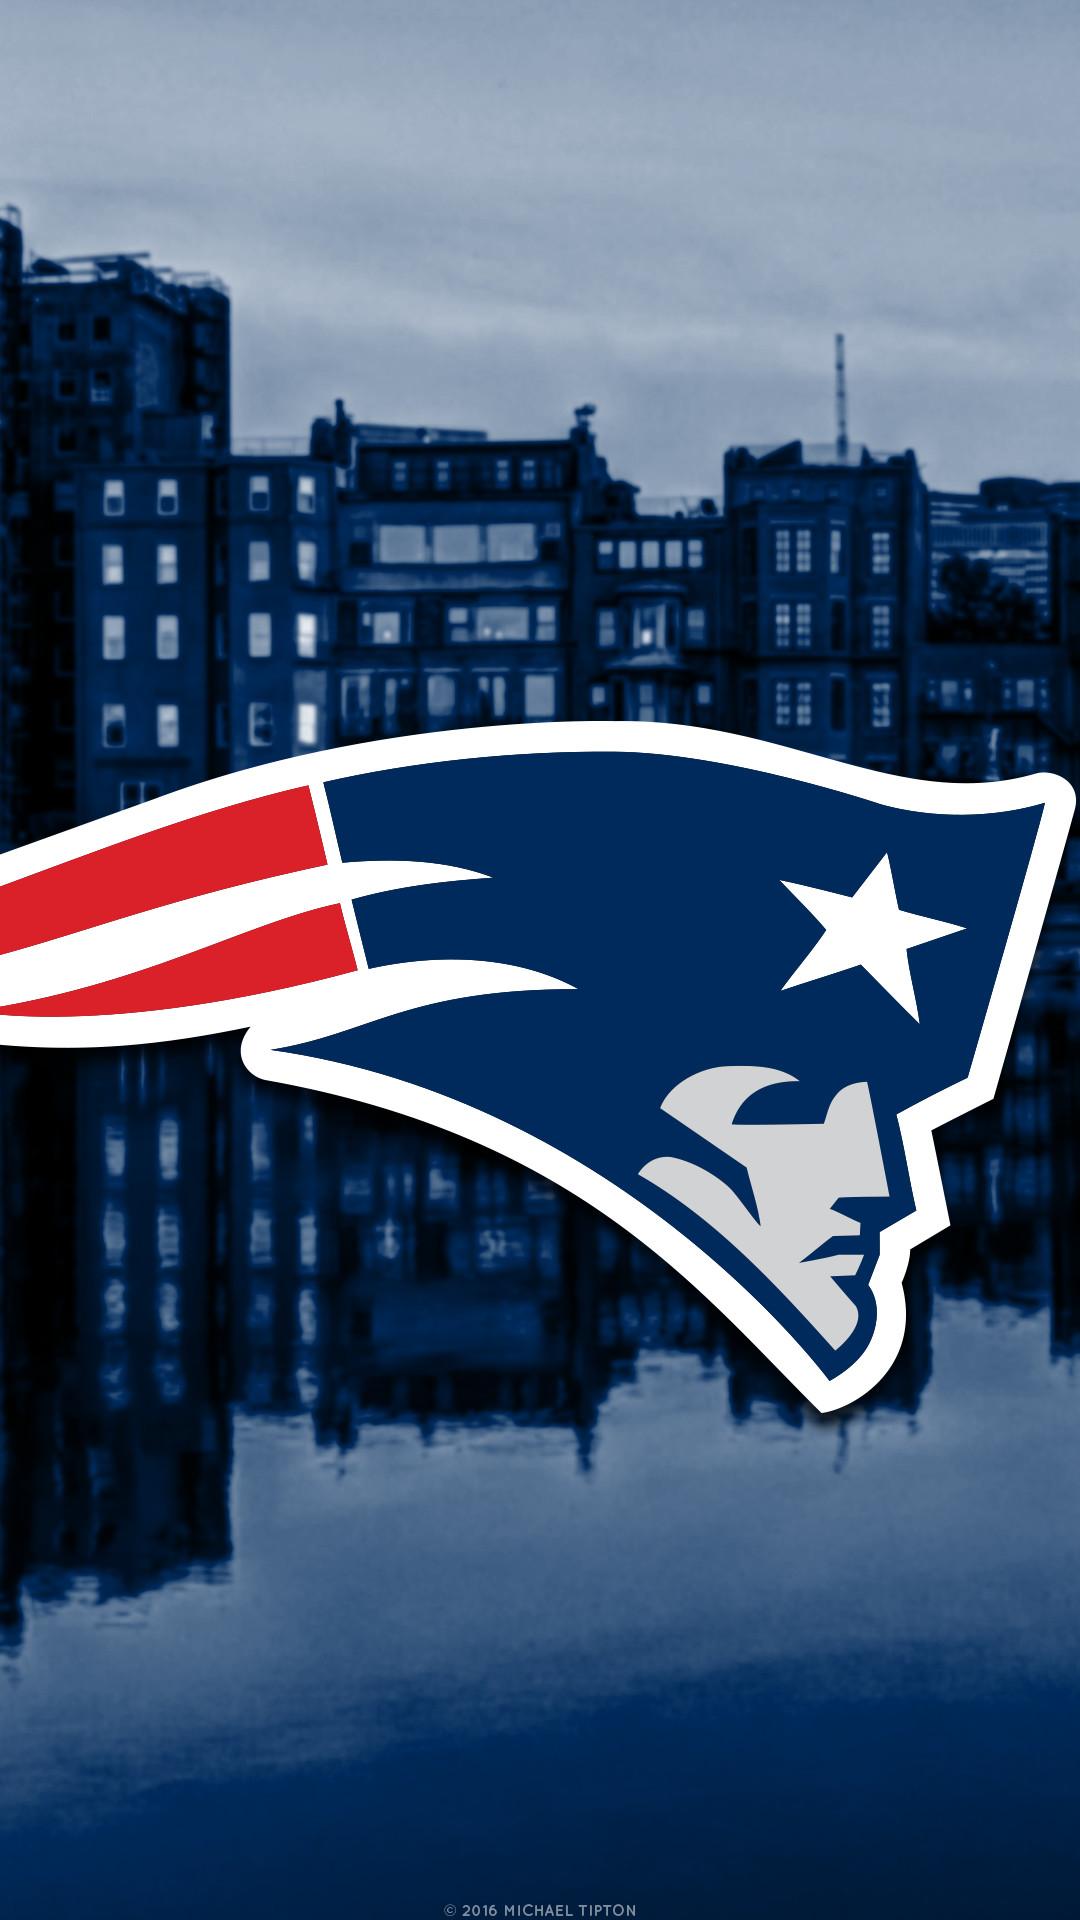 Tom Brady New England Patriots   HD Wallpapers   Pinterest   England  patriots, Hd wallpaper and Wallpaper